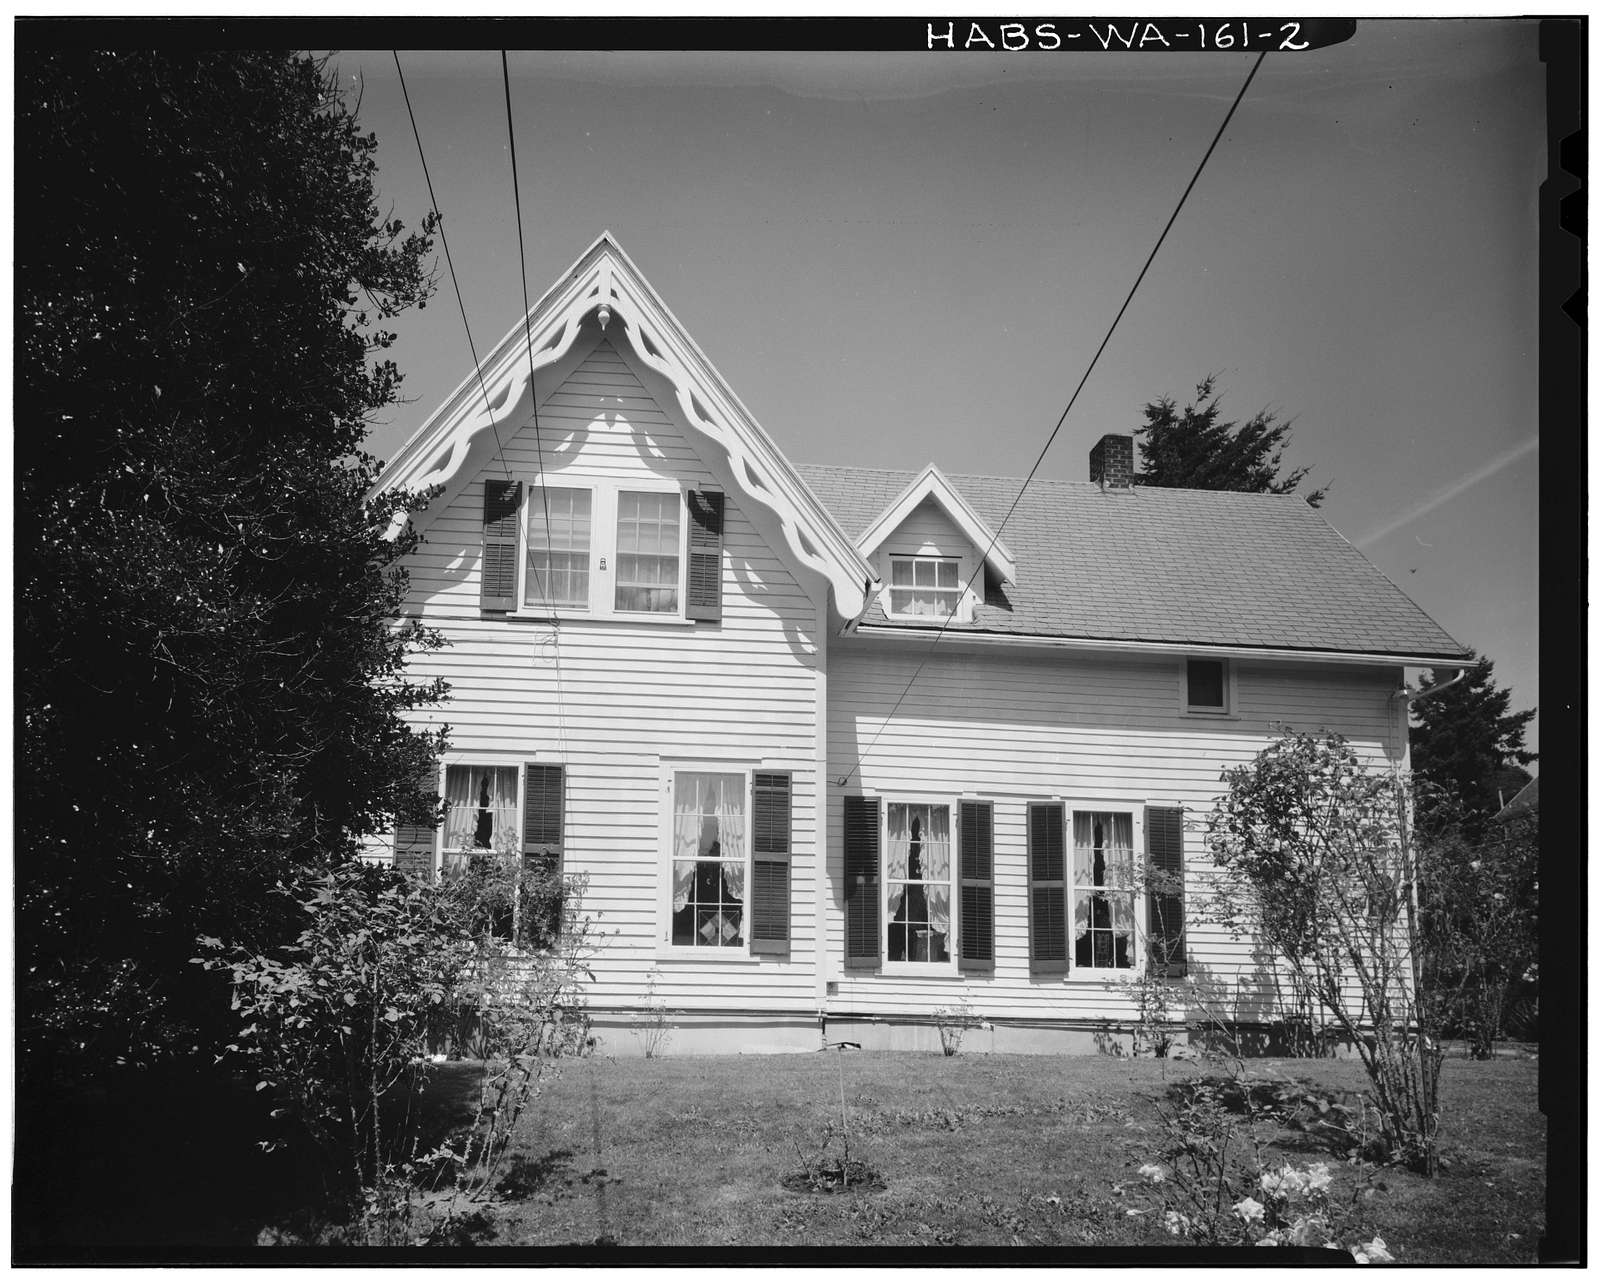 Daniel T. Bigelow House, 918 East Glass Avenue, Olympia, Thurston County, WA